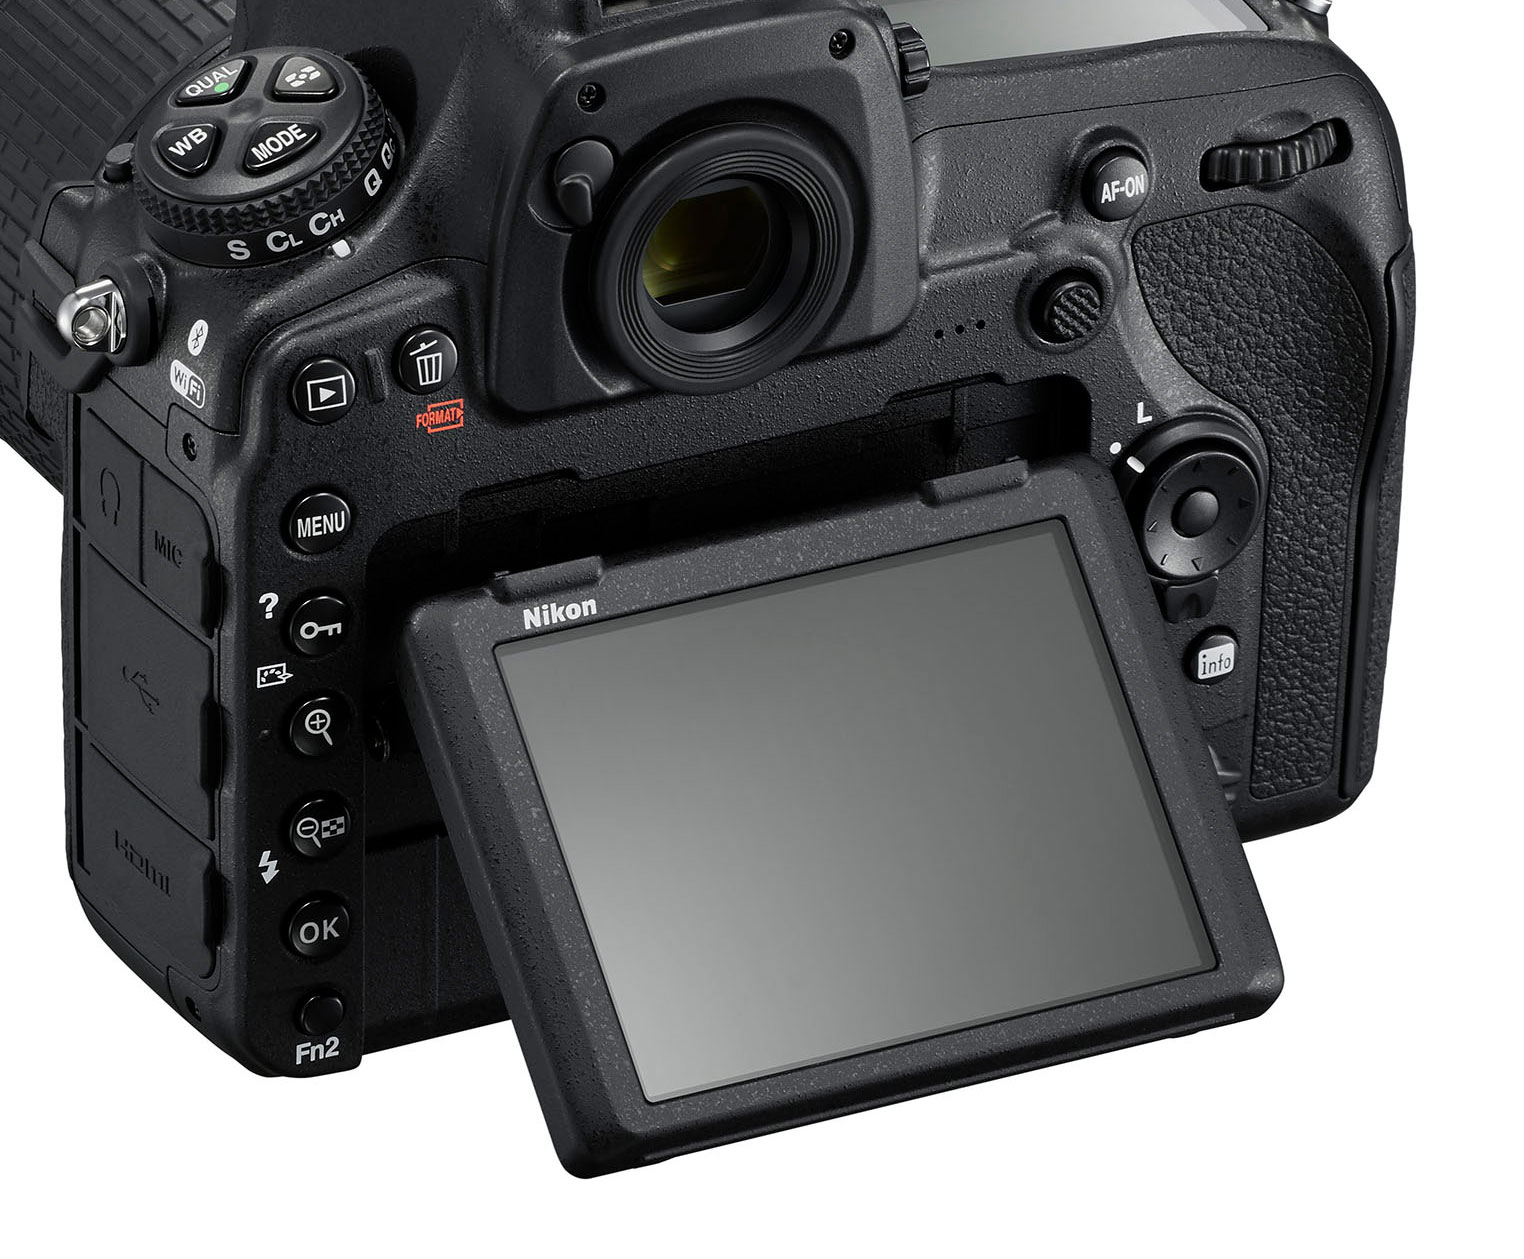 Test : Nikon D850 - 4K(önigin) für Vollformat-DSLR-Filmer : 4K ...